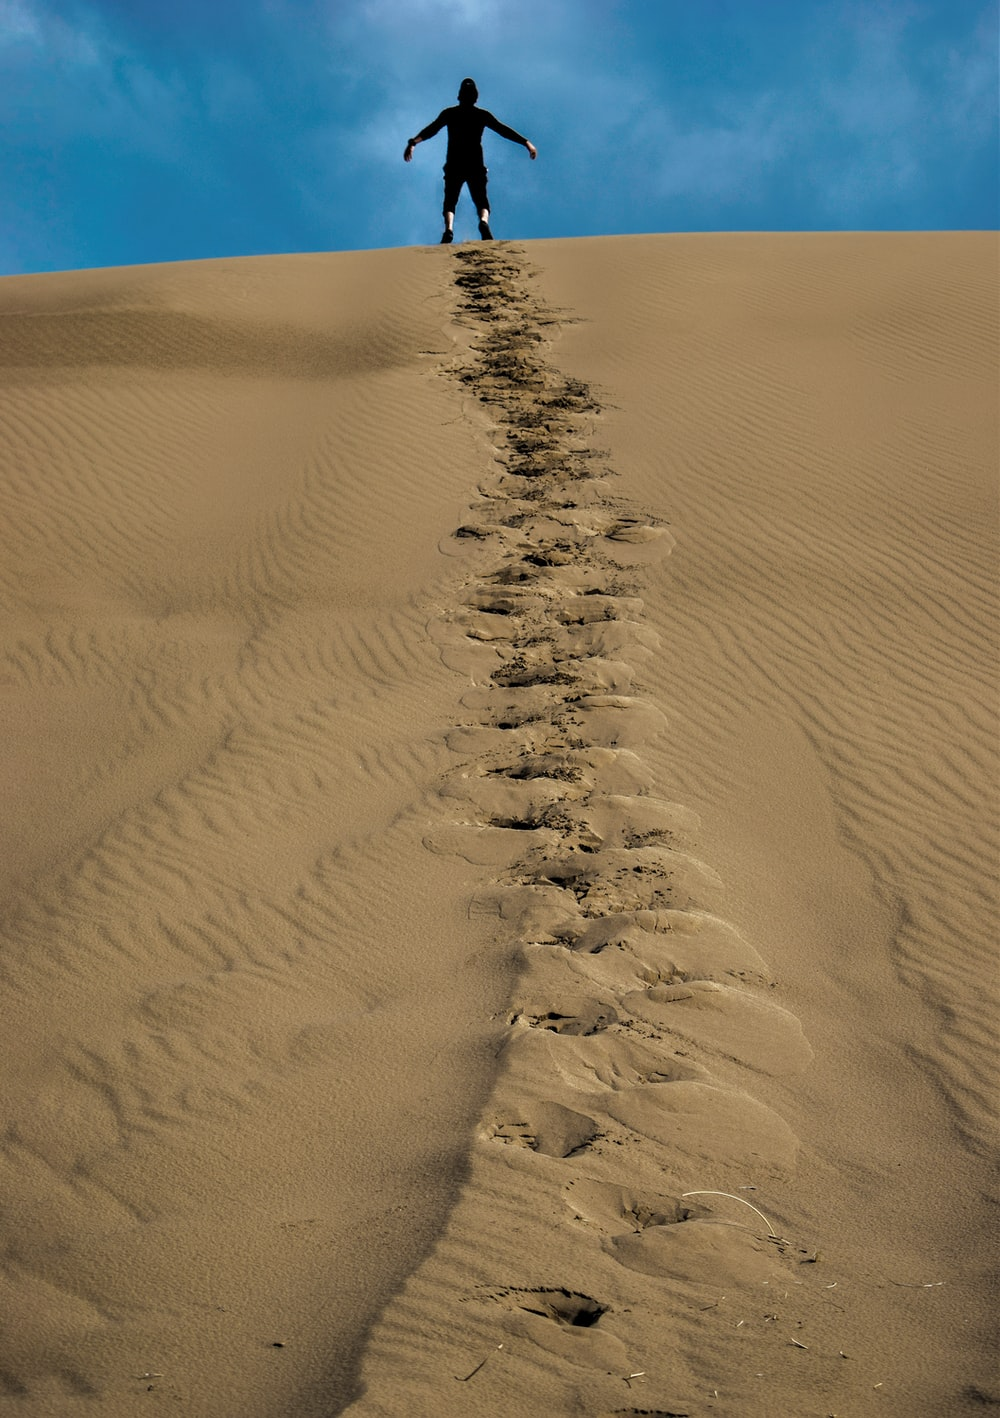 man on sand hill